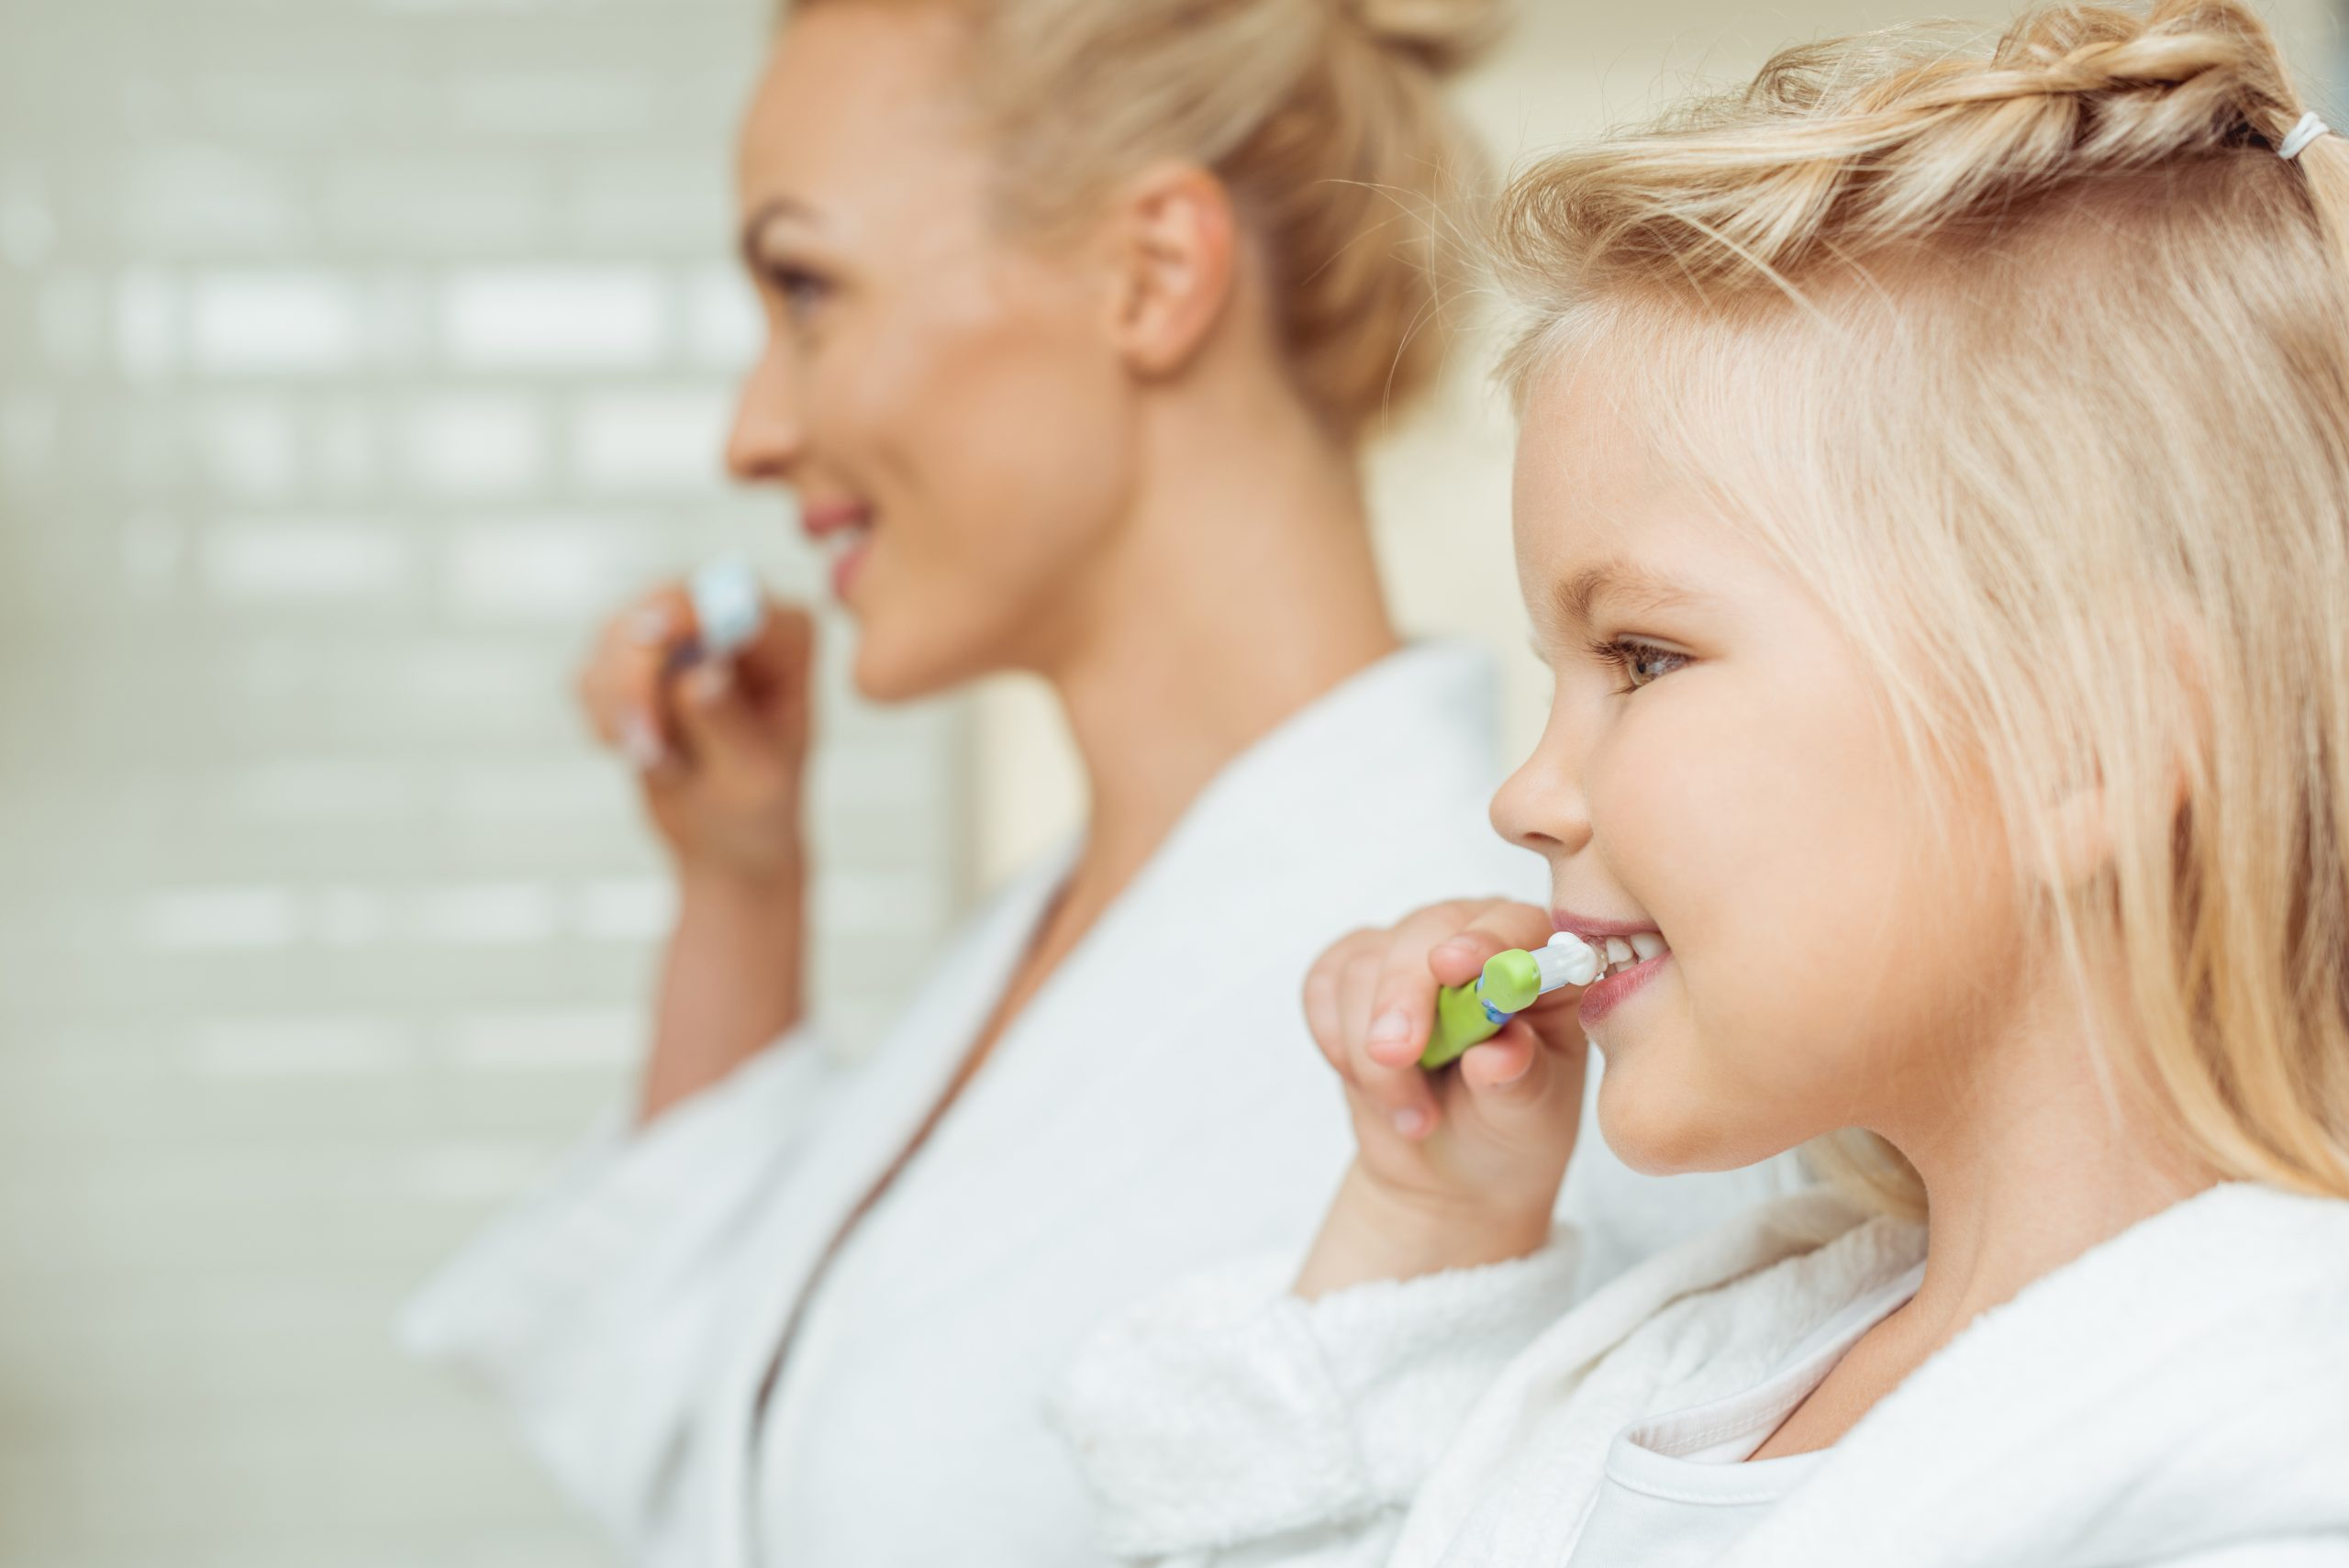 meilleur dentifrice selon ses besoins